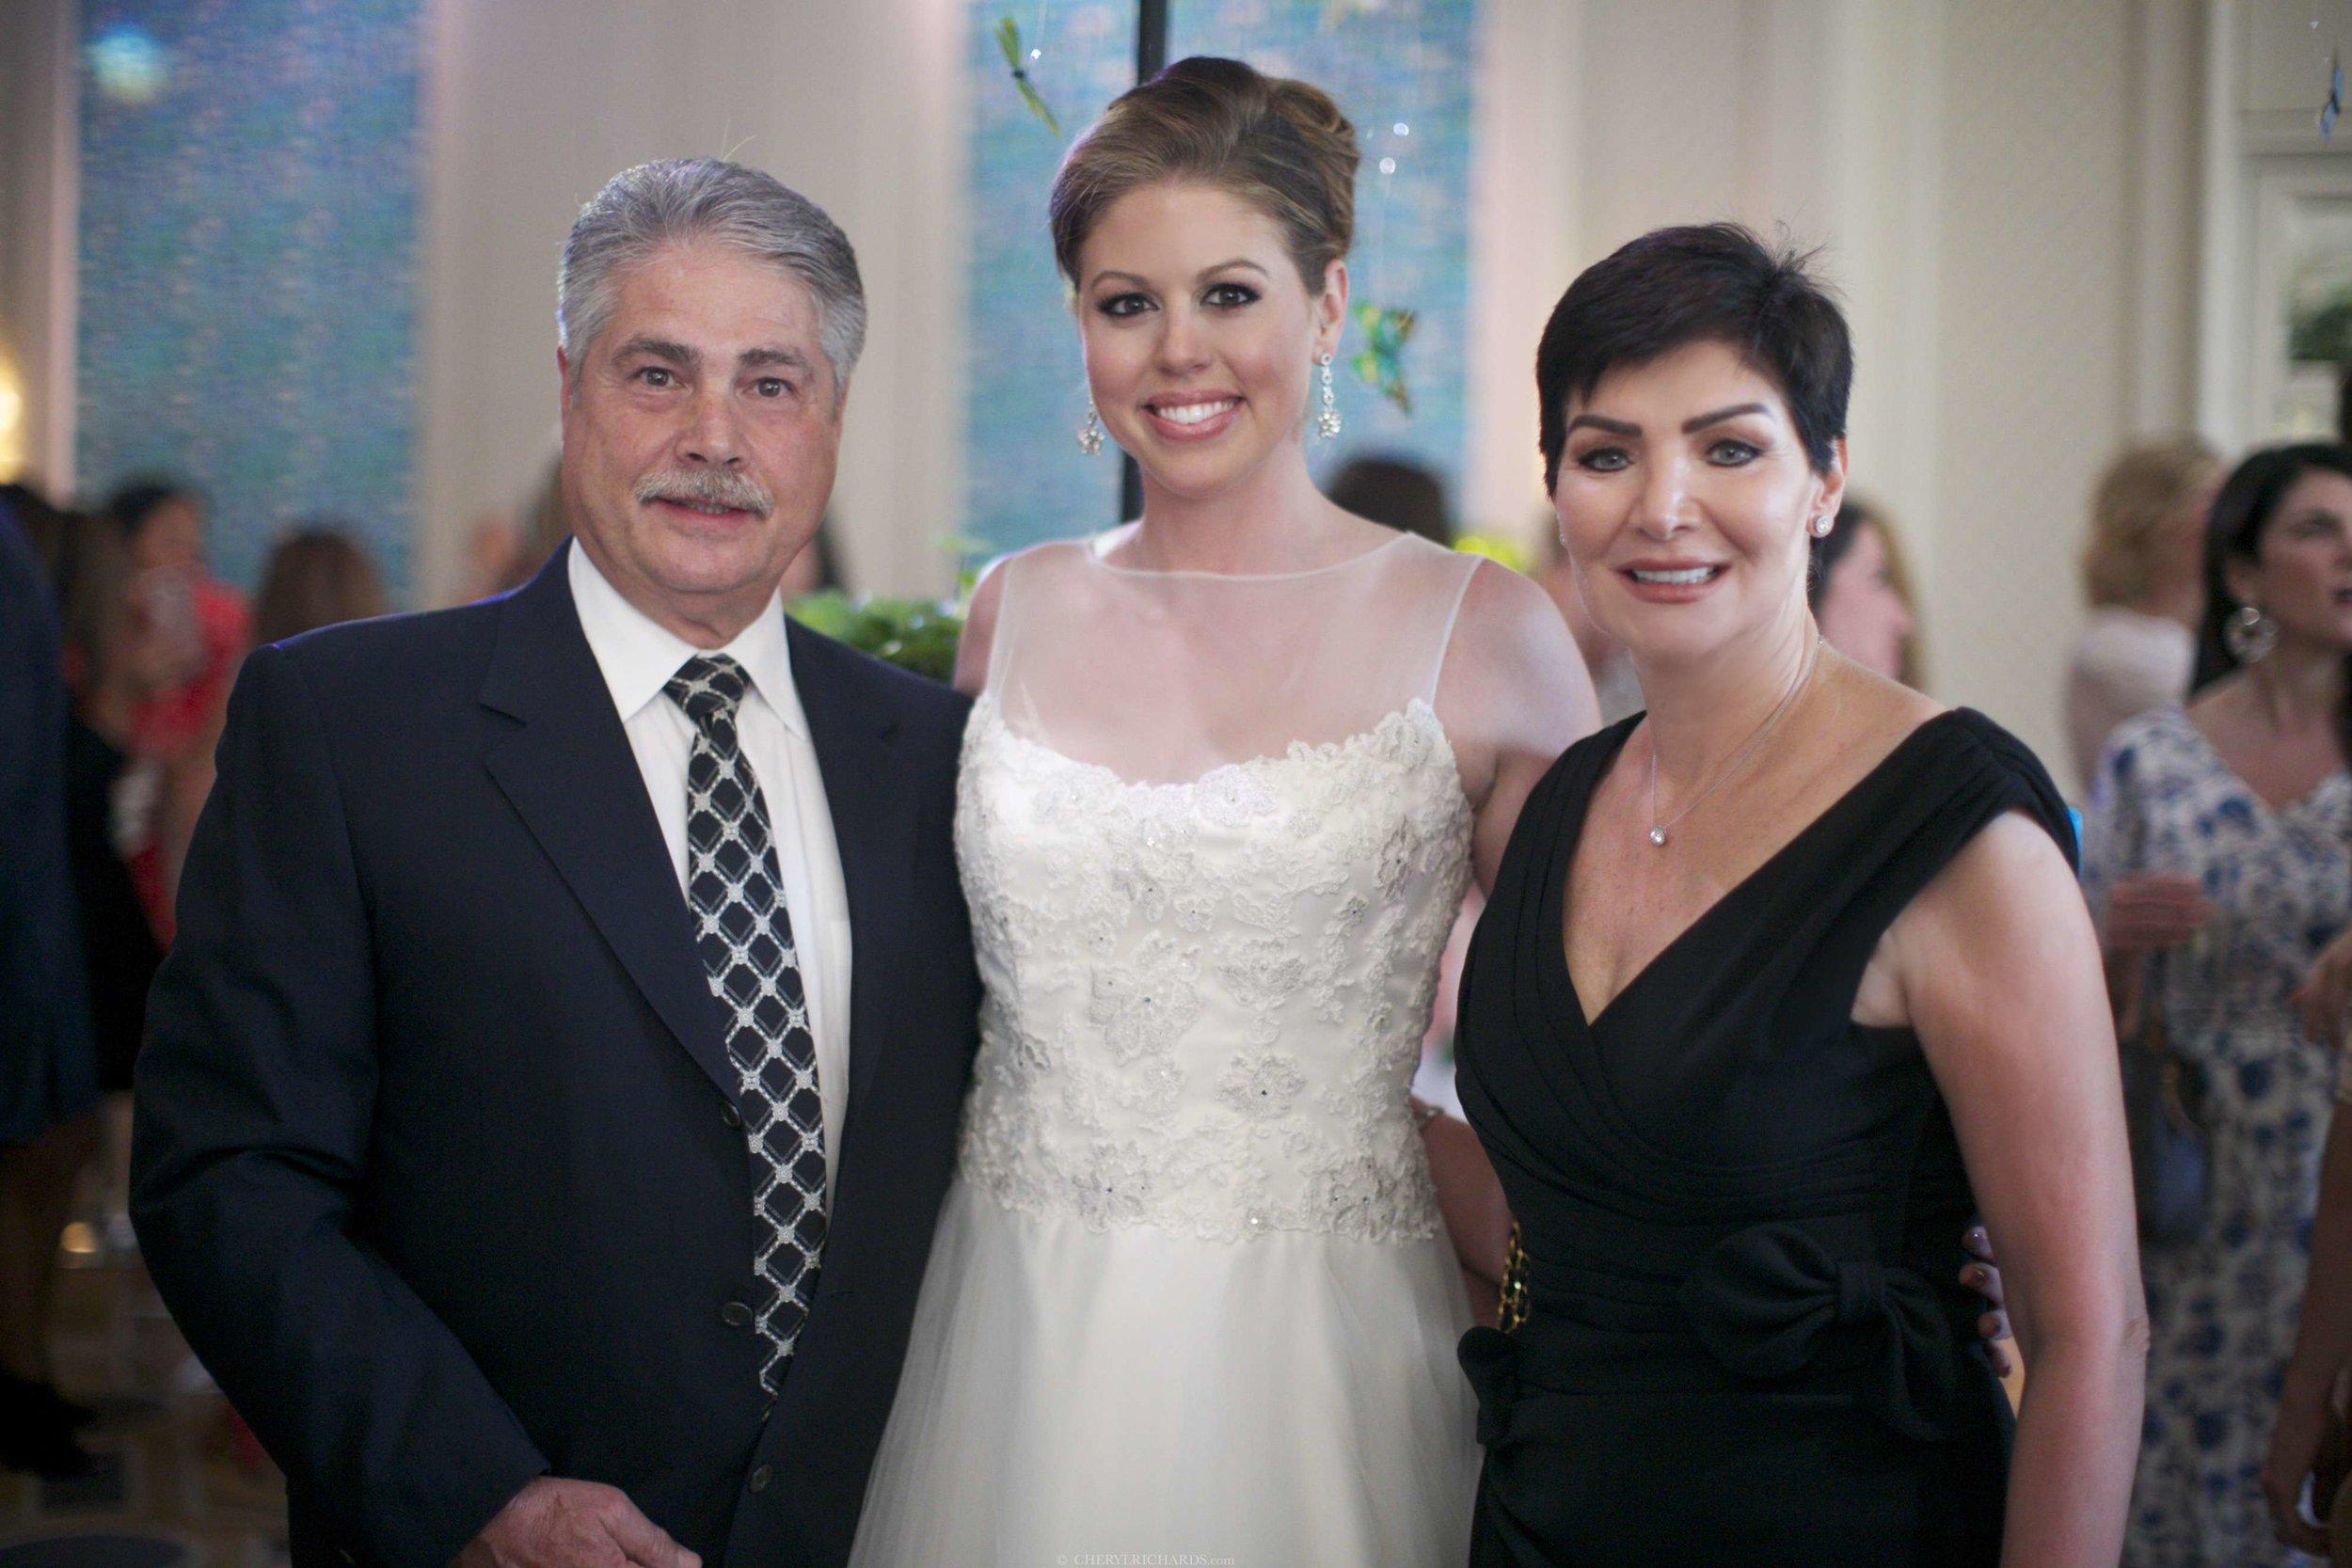 Wedding Launch photos CherylRIchards 0059.jpg